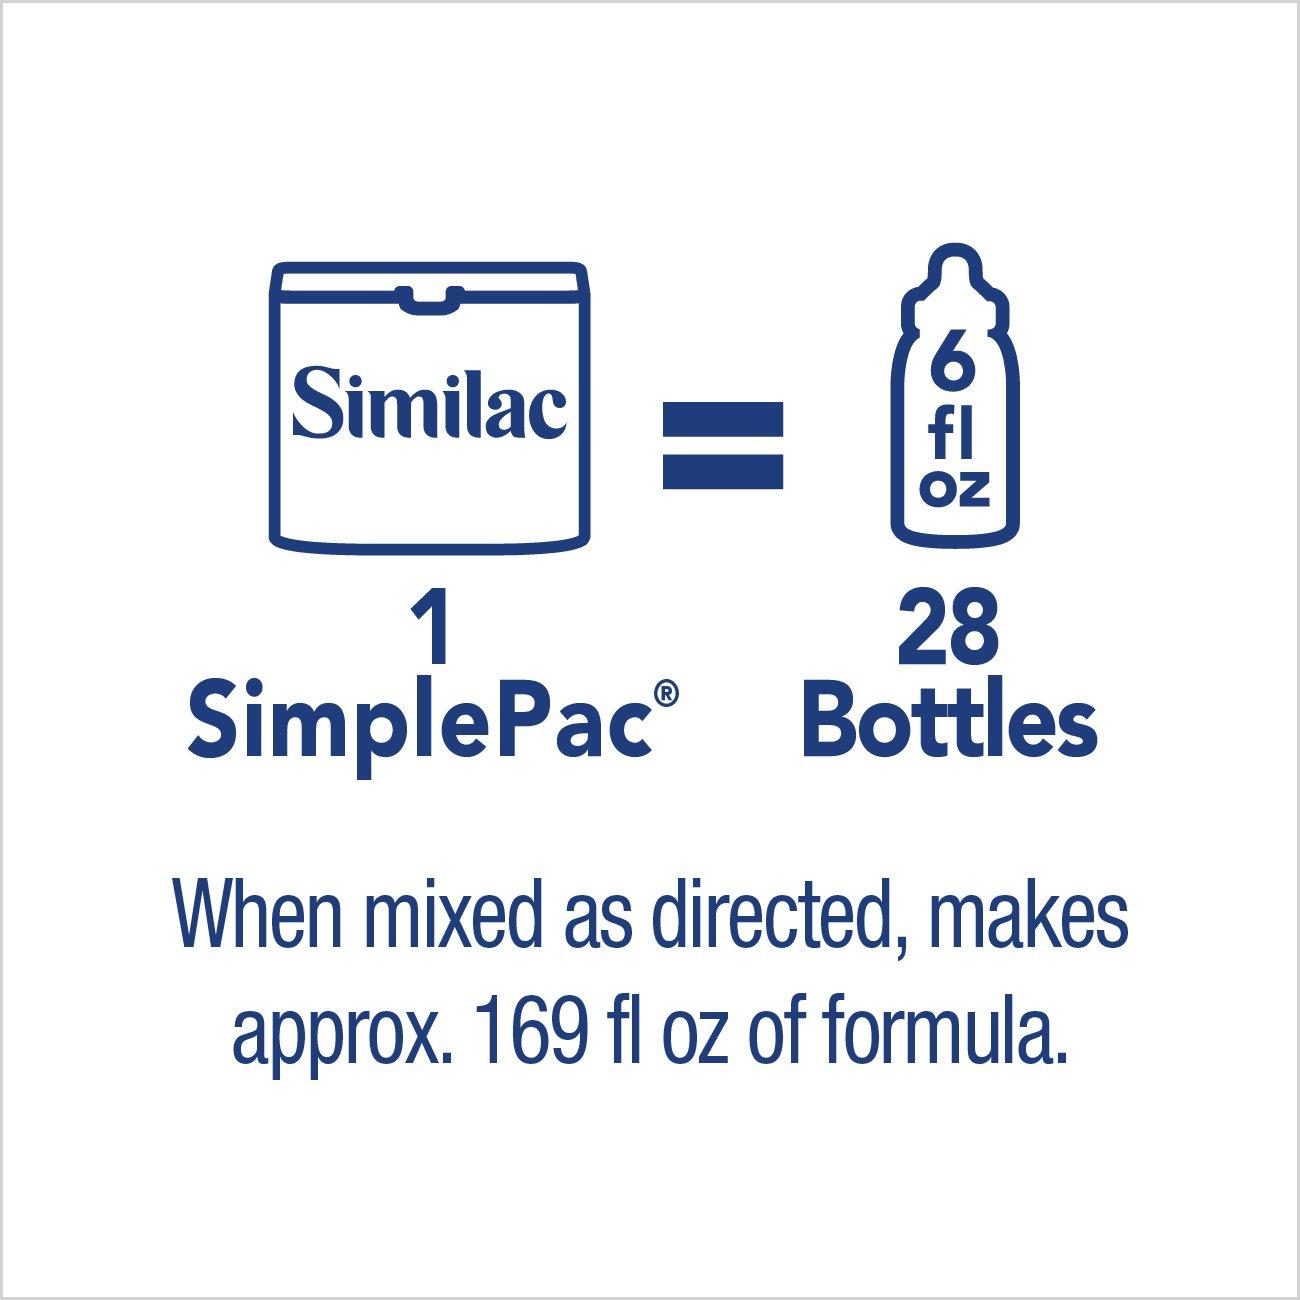 Similac Organic Infant Formula with Iron, USDA Certified Organic, Baby Formula, Powder, 1.45 lb (Pack of 6) by Similac (Image #7)